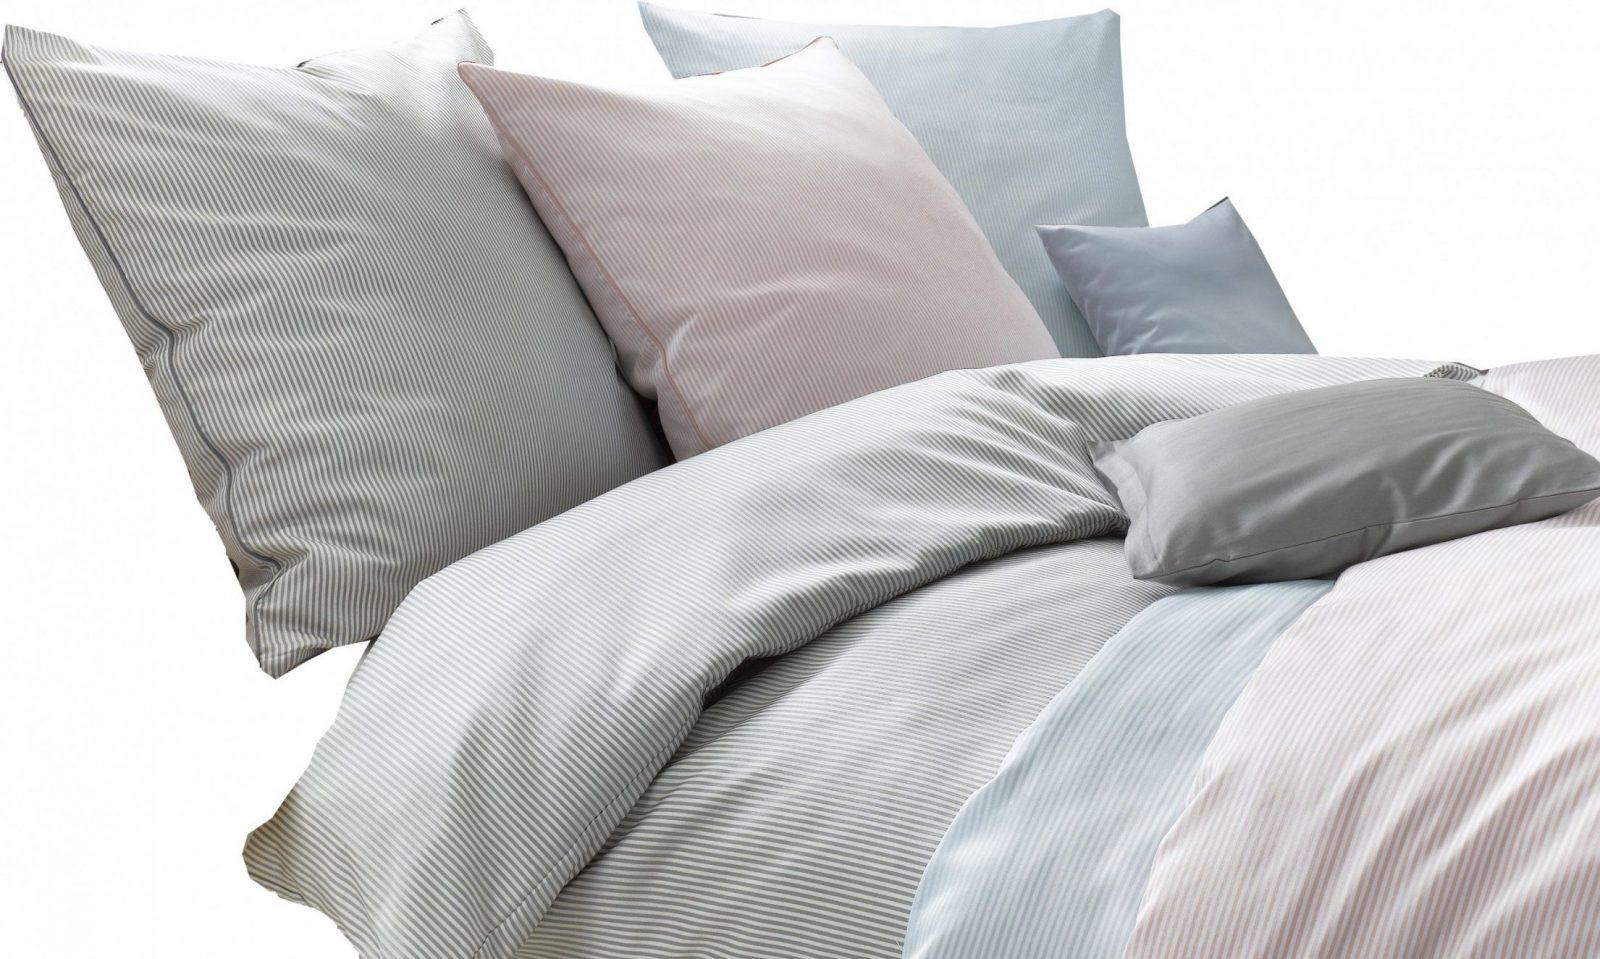 bettw sche 155x200 mako satin haus design ideen. Black Bedroom Furniture Sets. Home Design Ideas